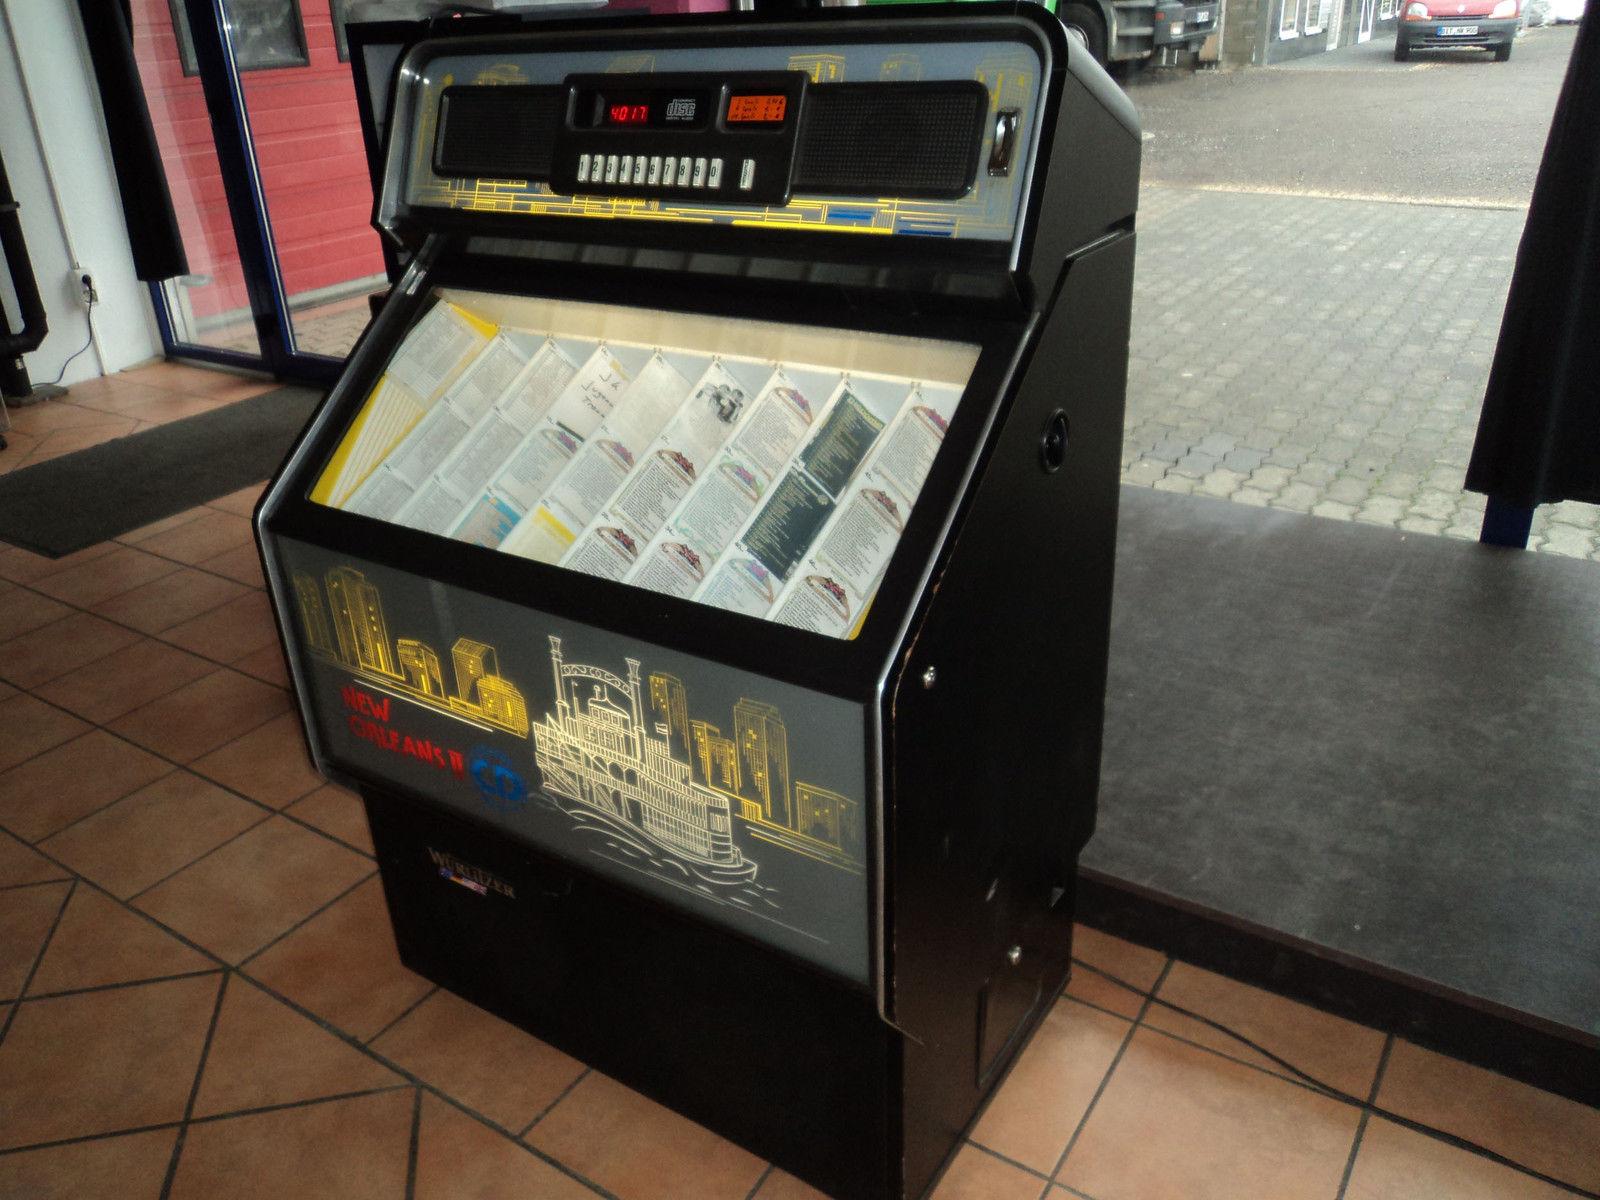 Kühlschrank Jukebox : ᐅ wurlitzer jukebox musikbox modell cdm i sehr selten mit